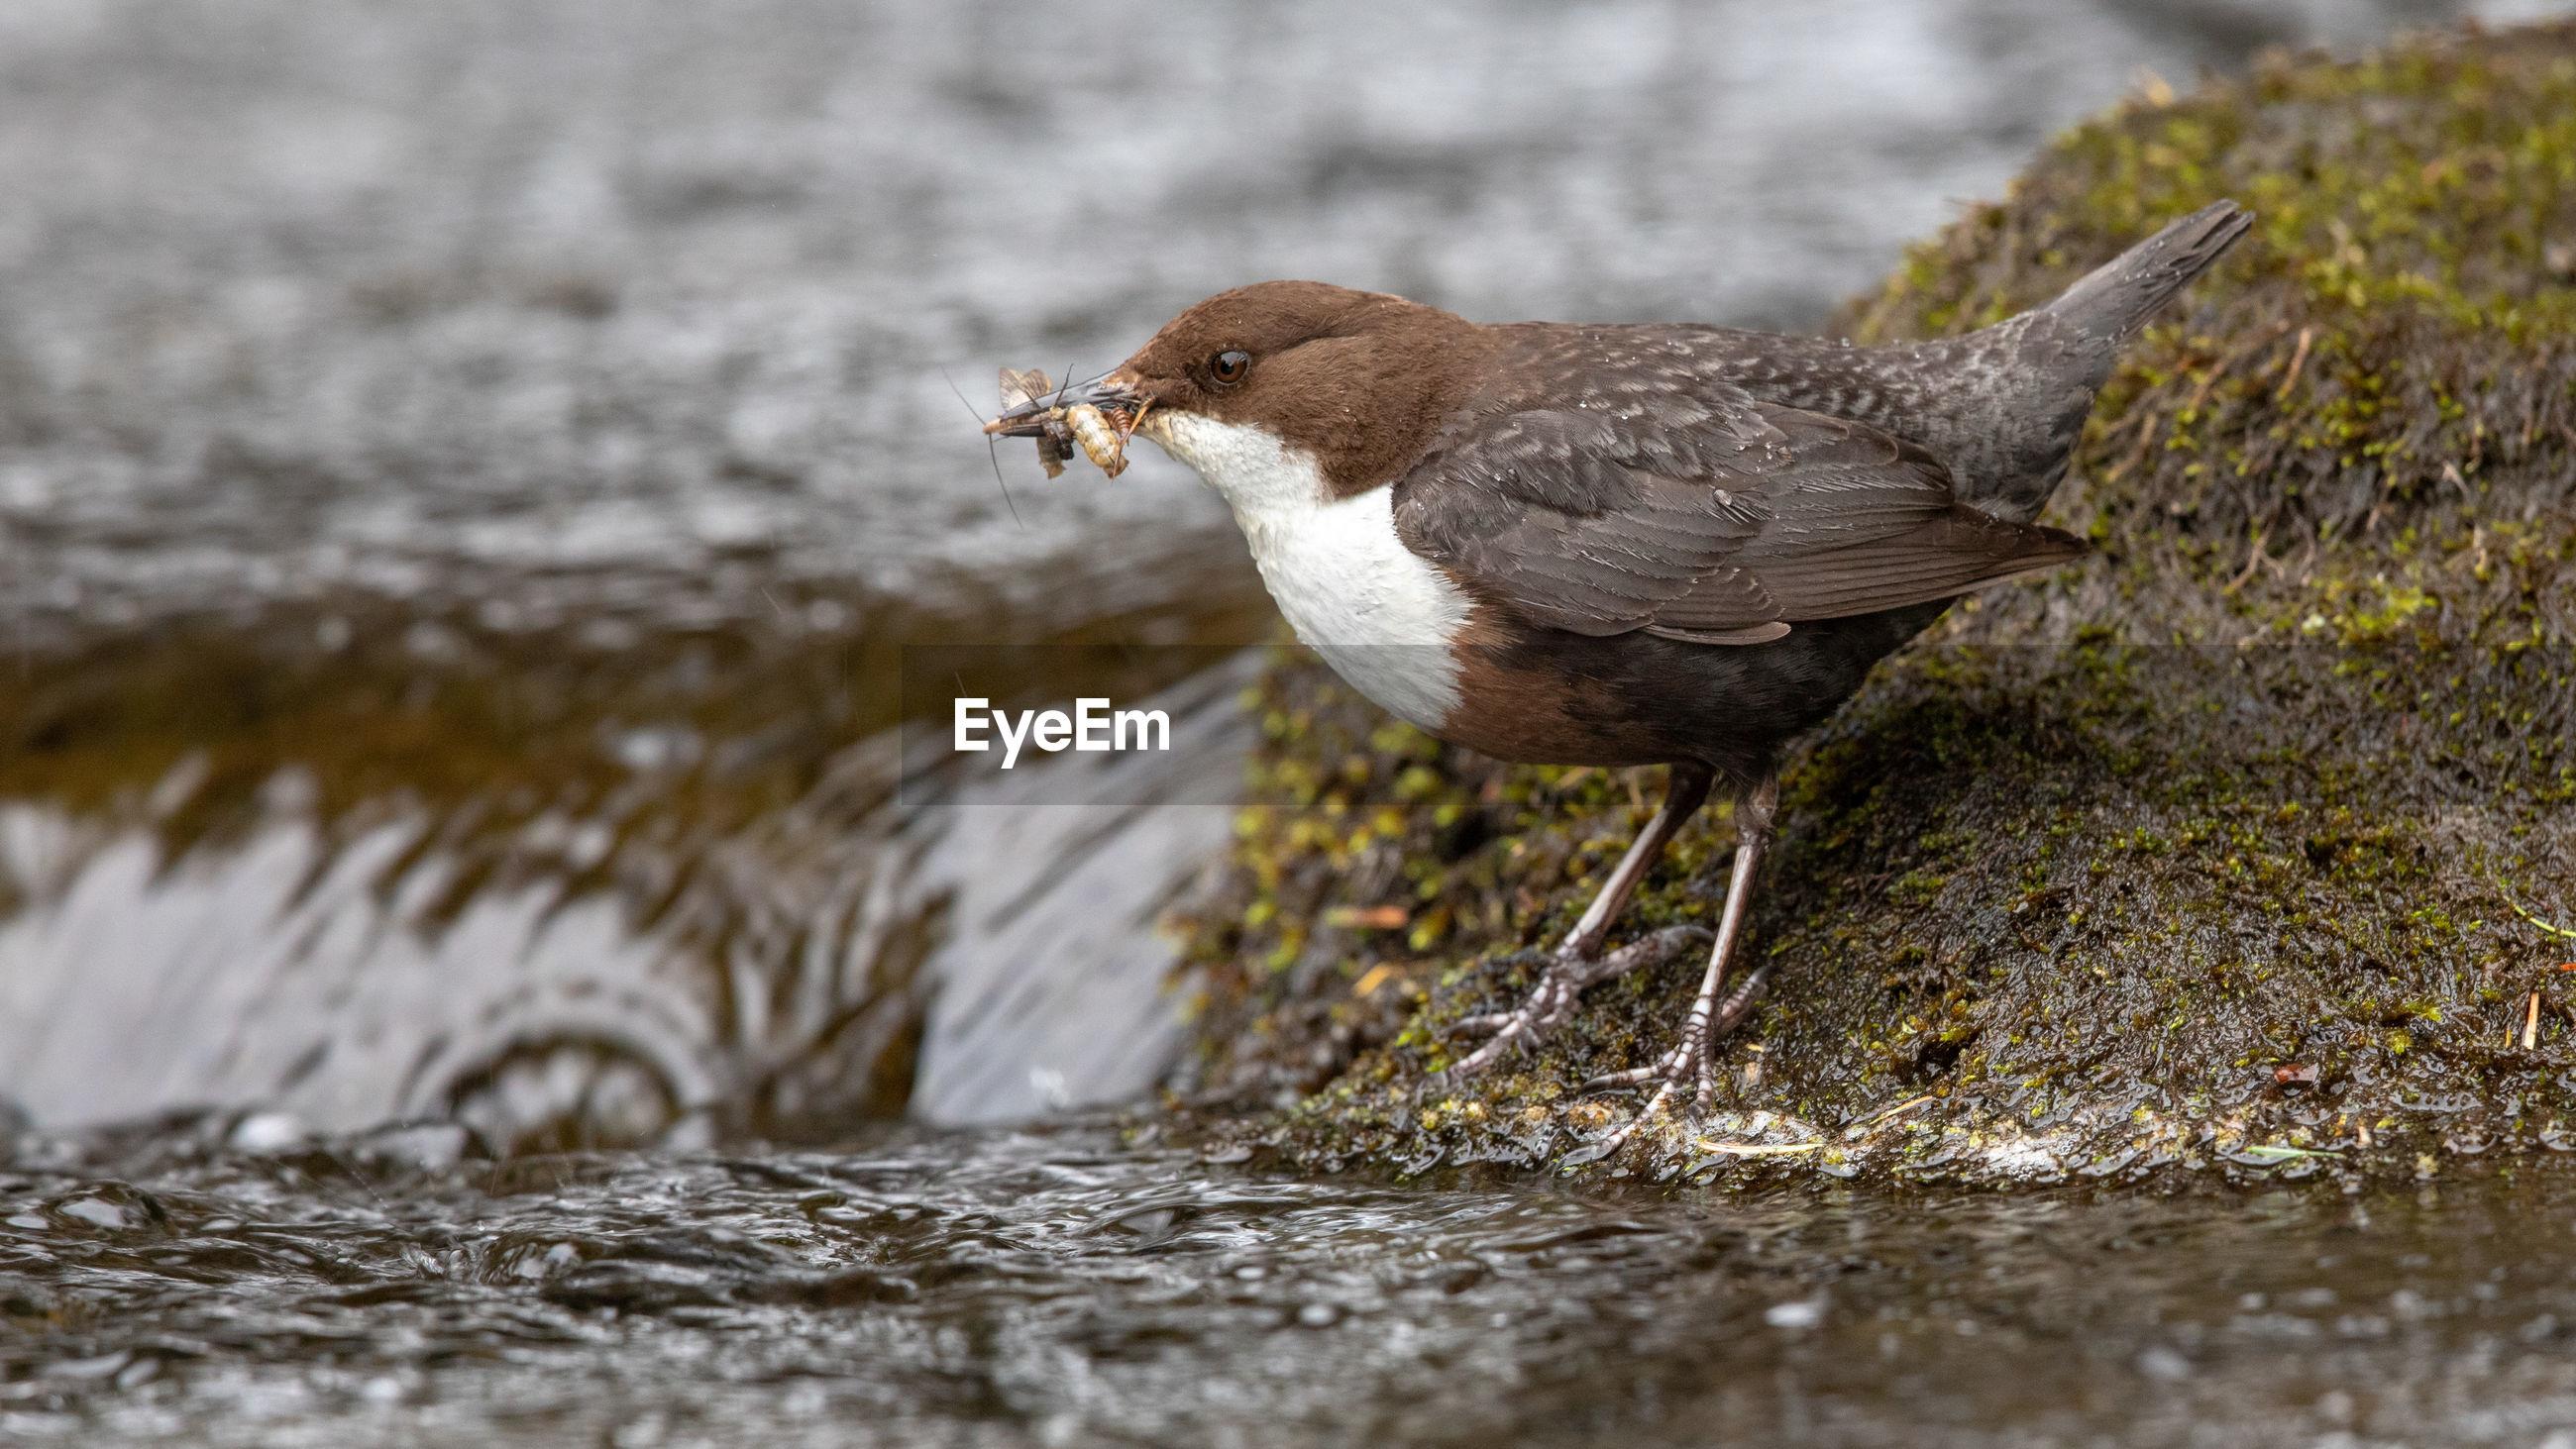 Close-up of bird perching on rock at stream